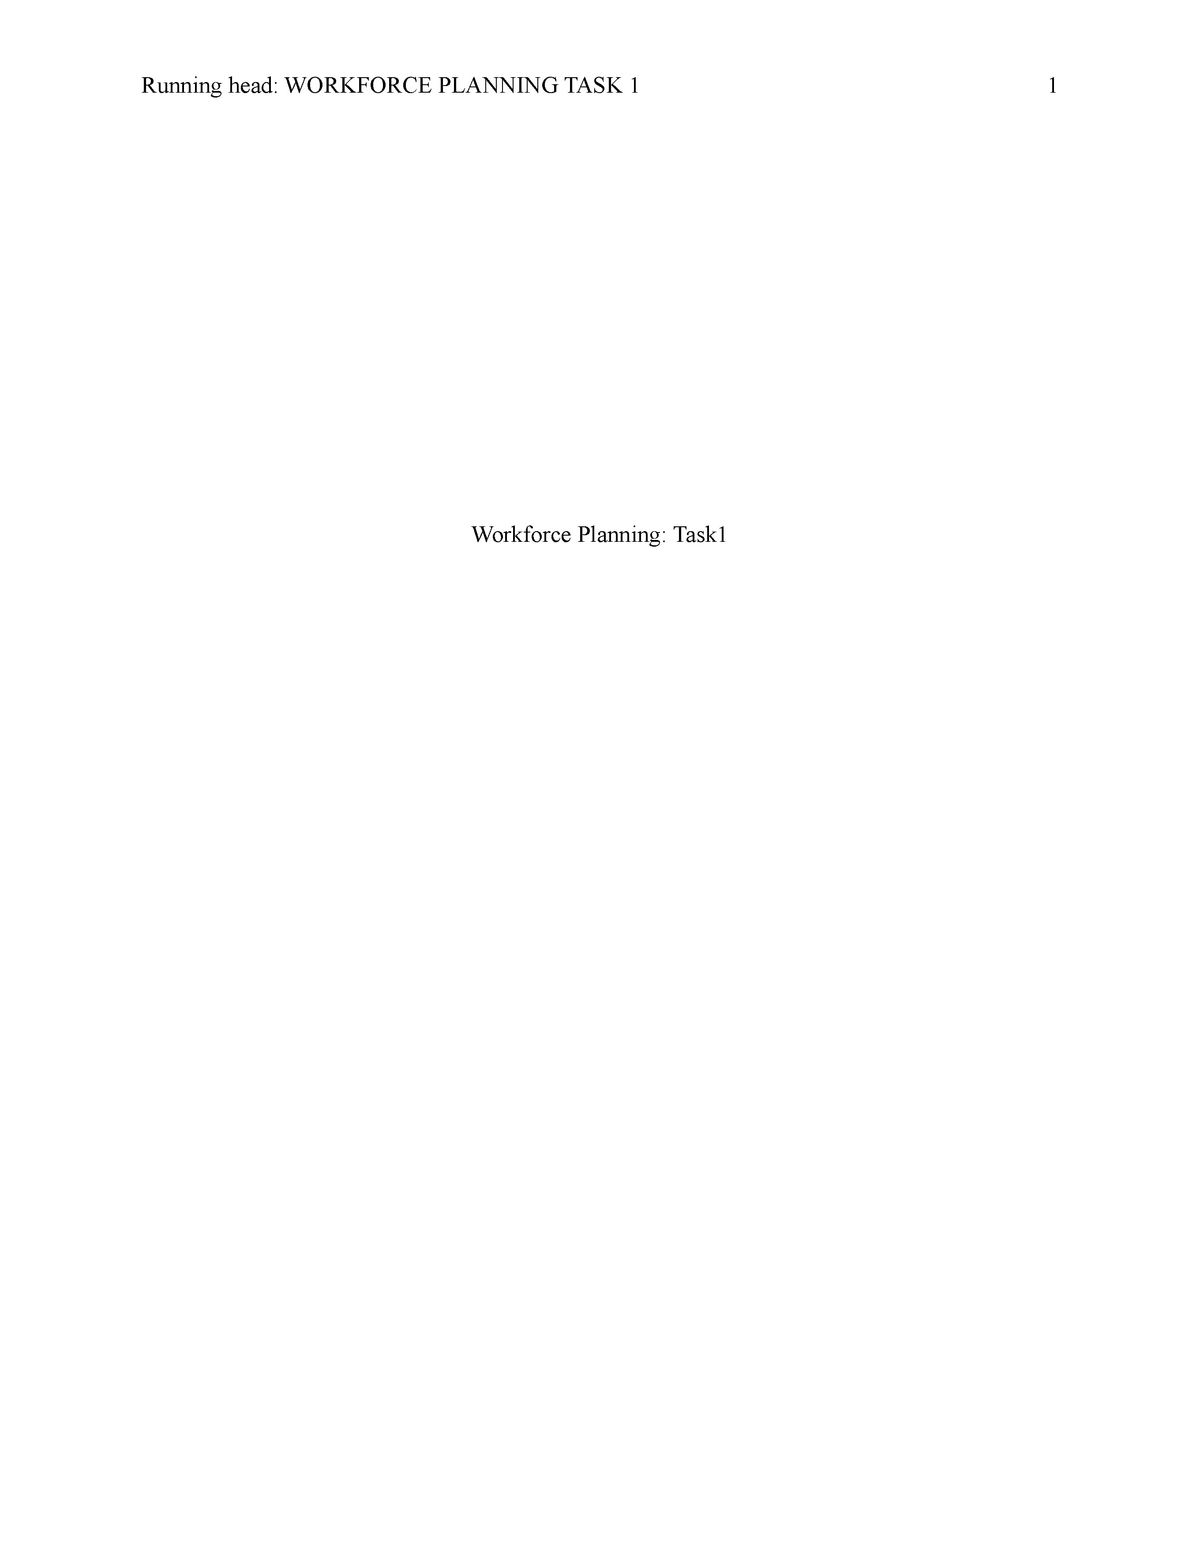 C234 Task 1 - Darian Villalobos - HRM 3500: Training and Development